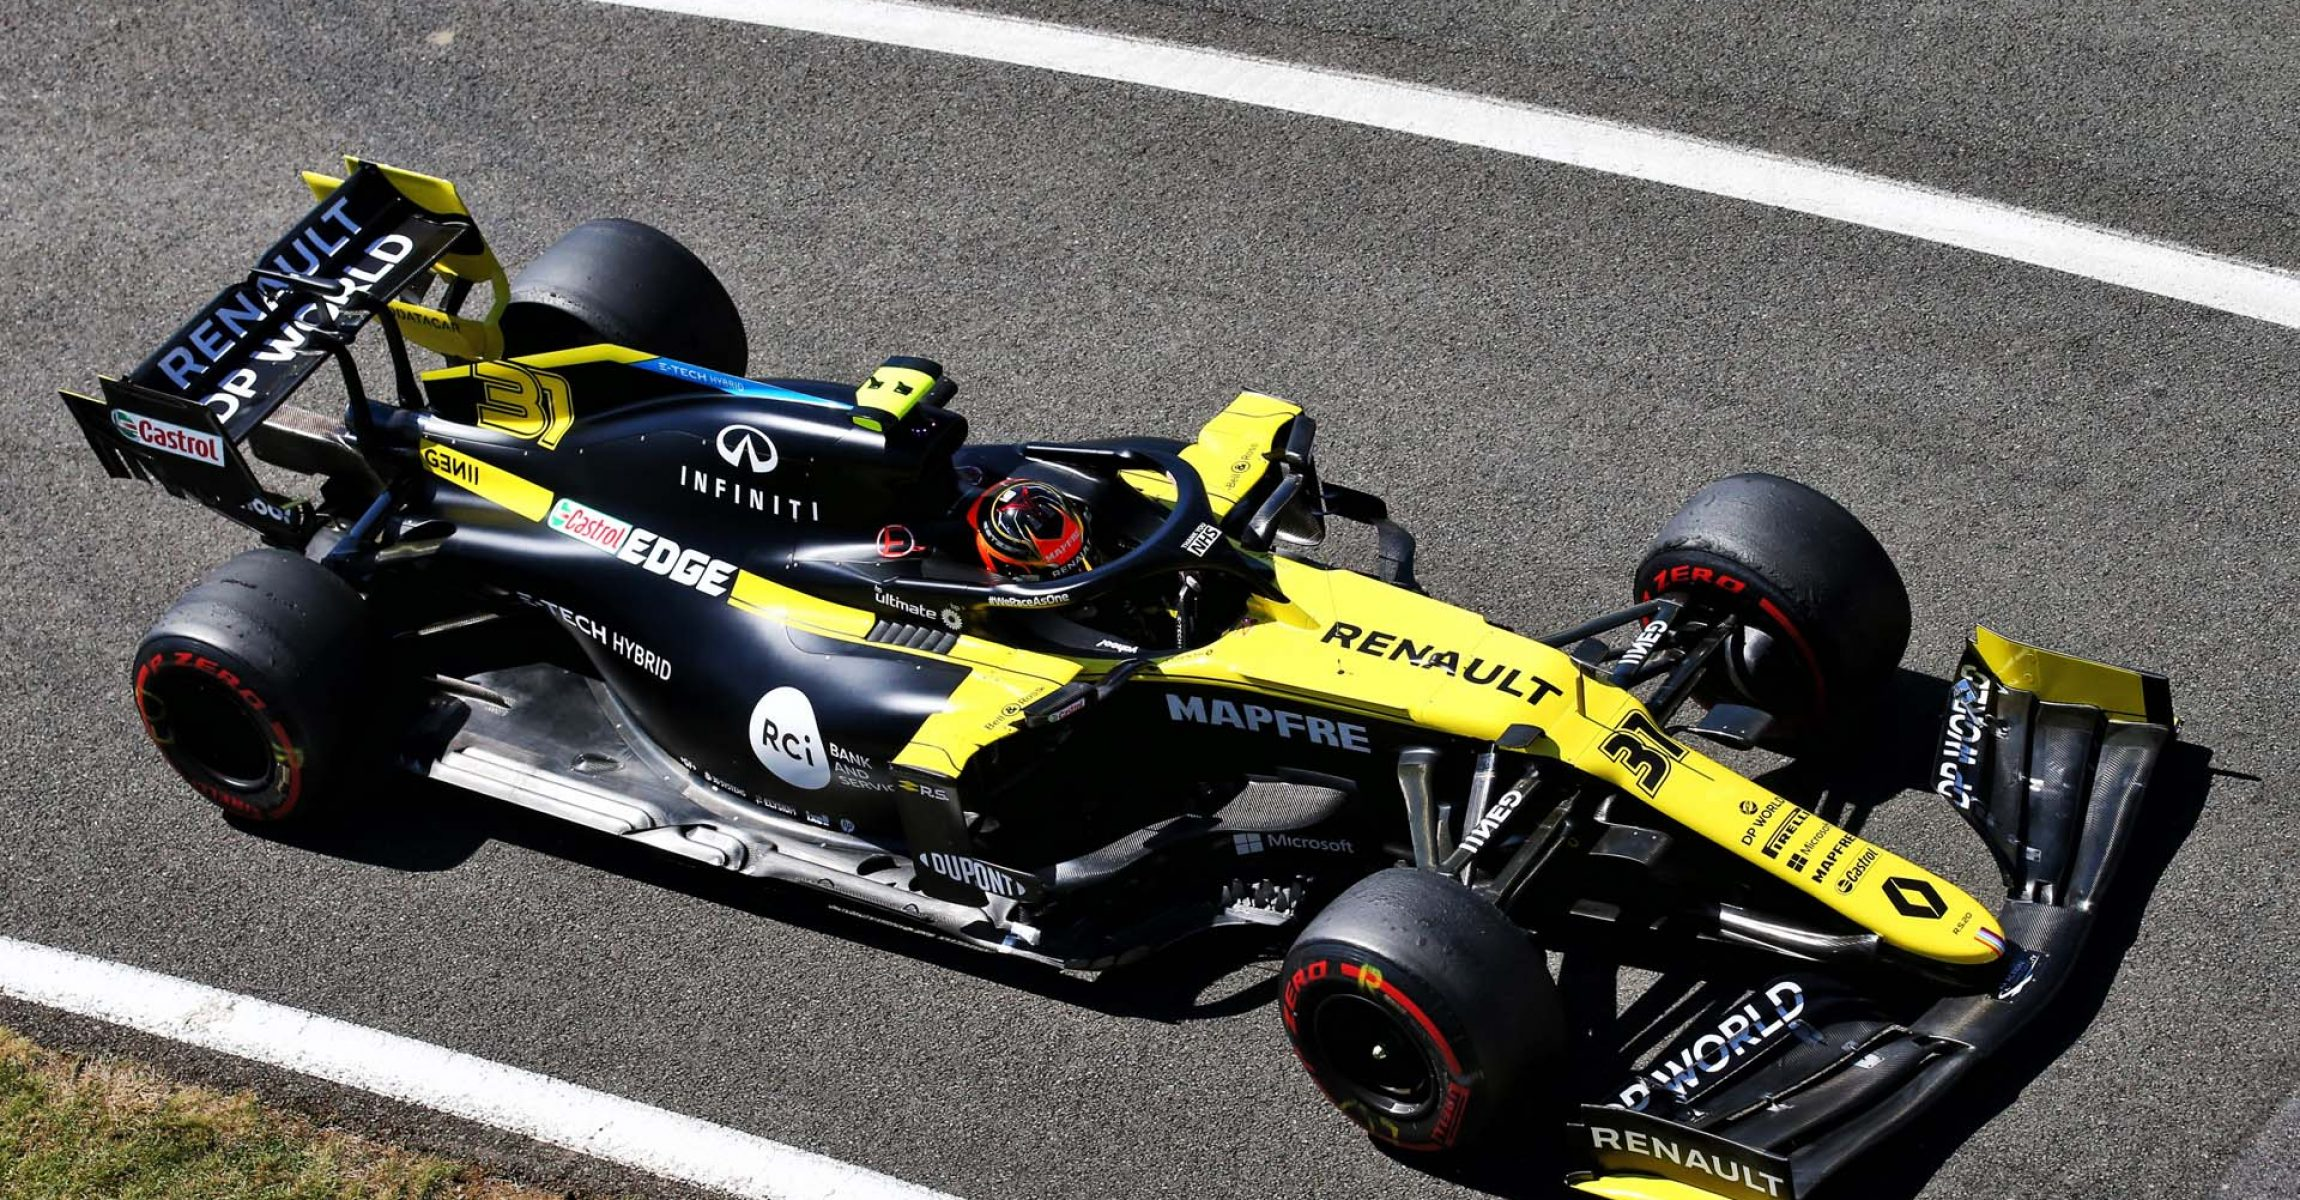 Esteban Ocon (FRA) Renault F1 Team RS20. 70th Anniversary Grand Prix, Friday 7th August 2020. Silverstone, England.